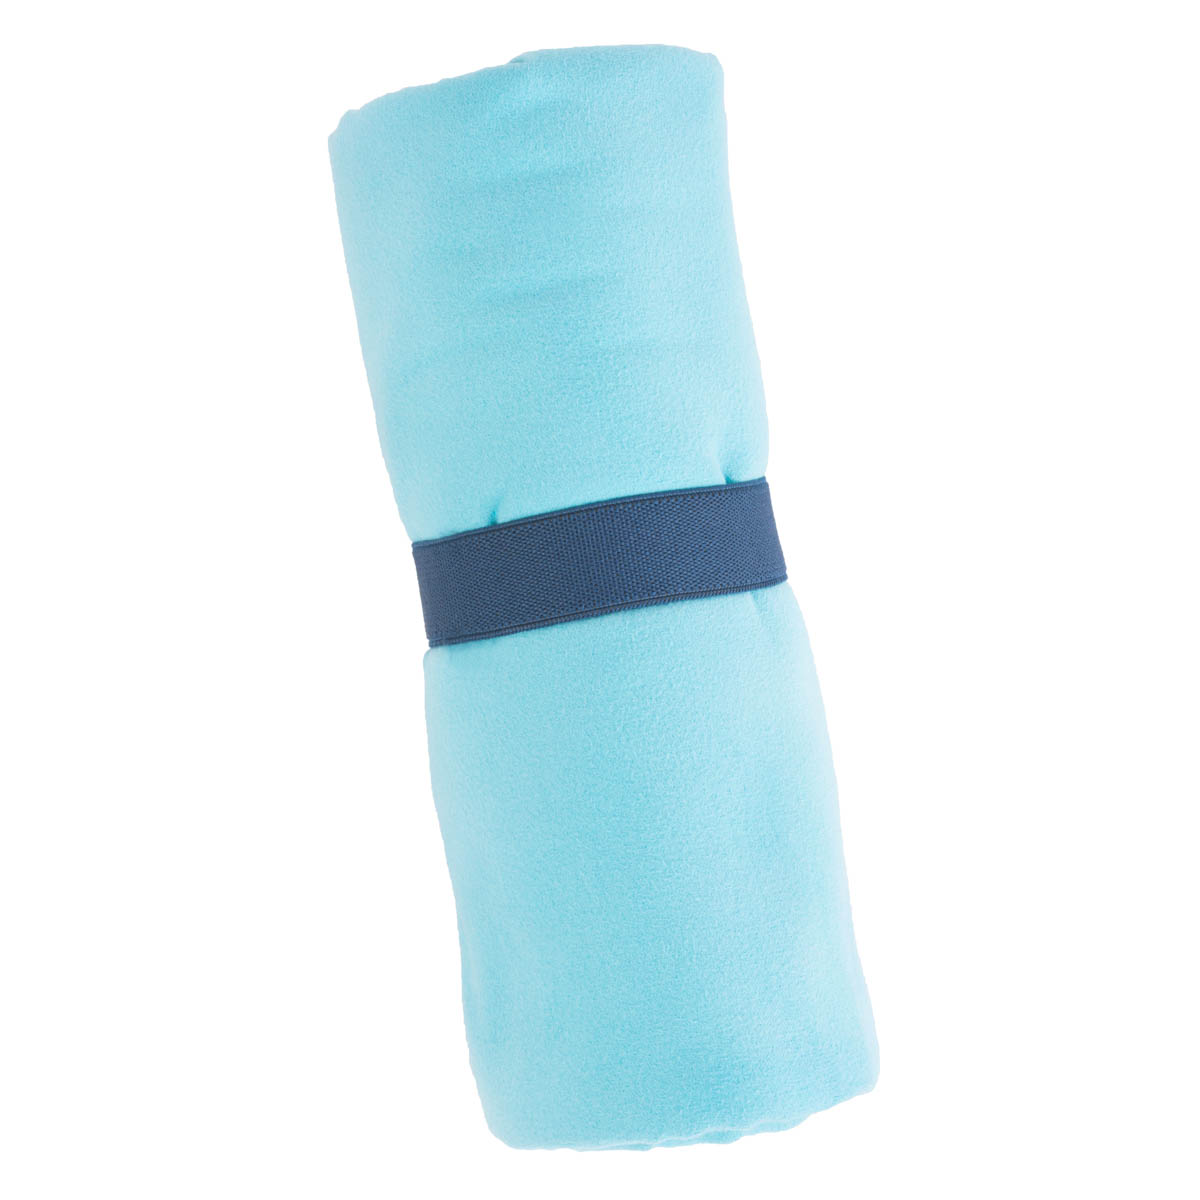 Clarysse Microvezel sneldrogende handdoek 50x100 Aqua